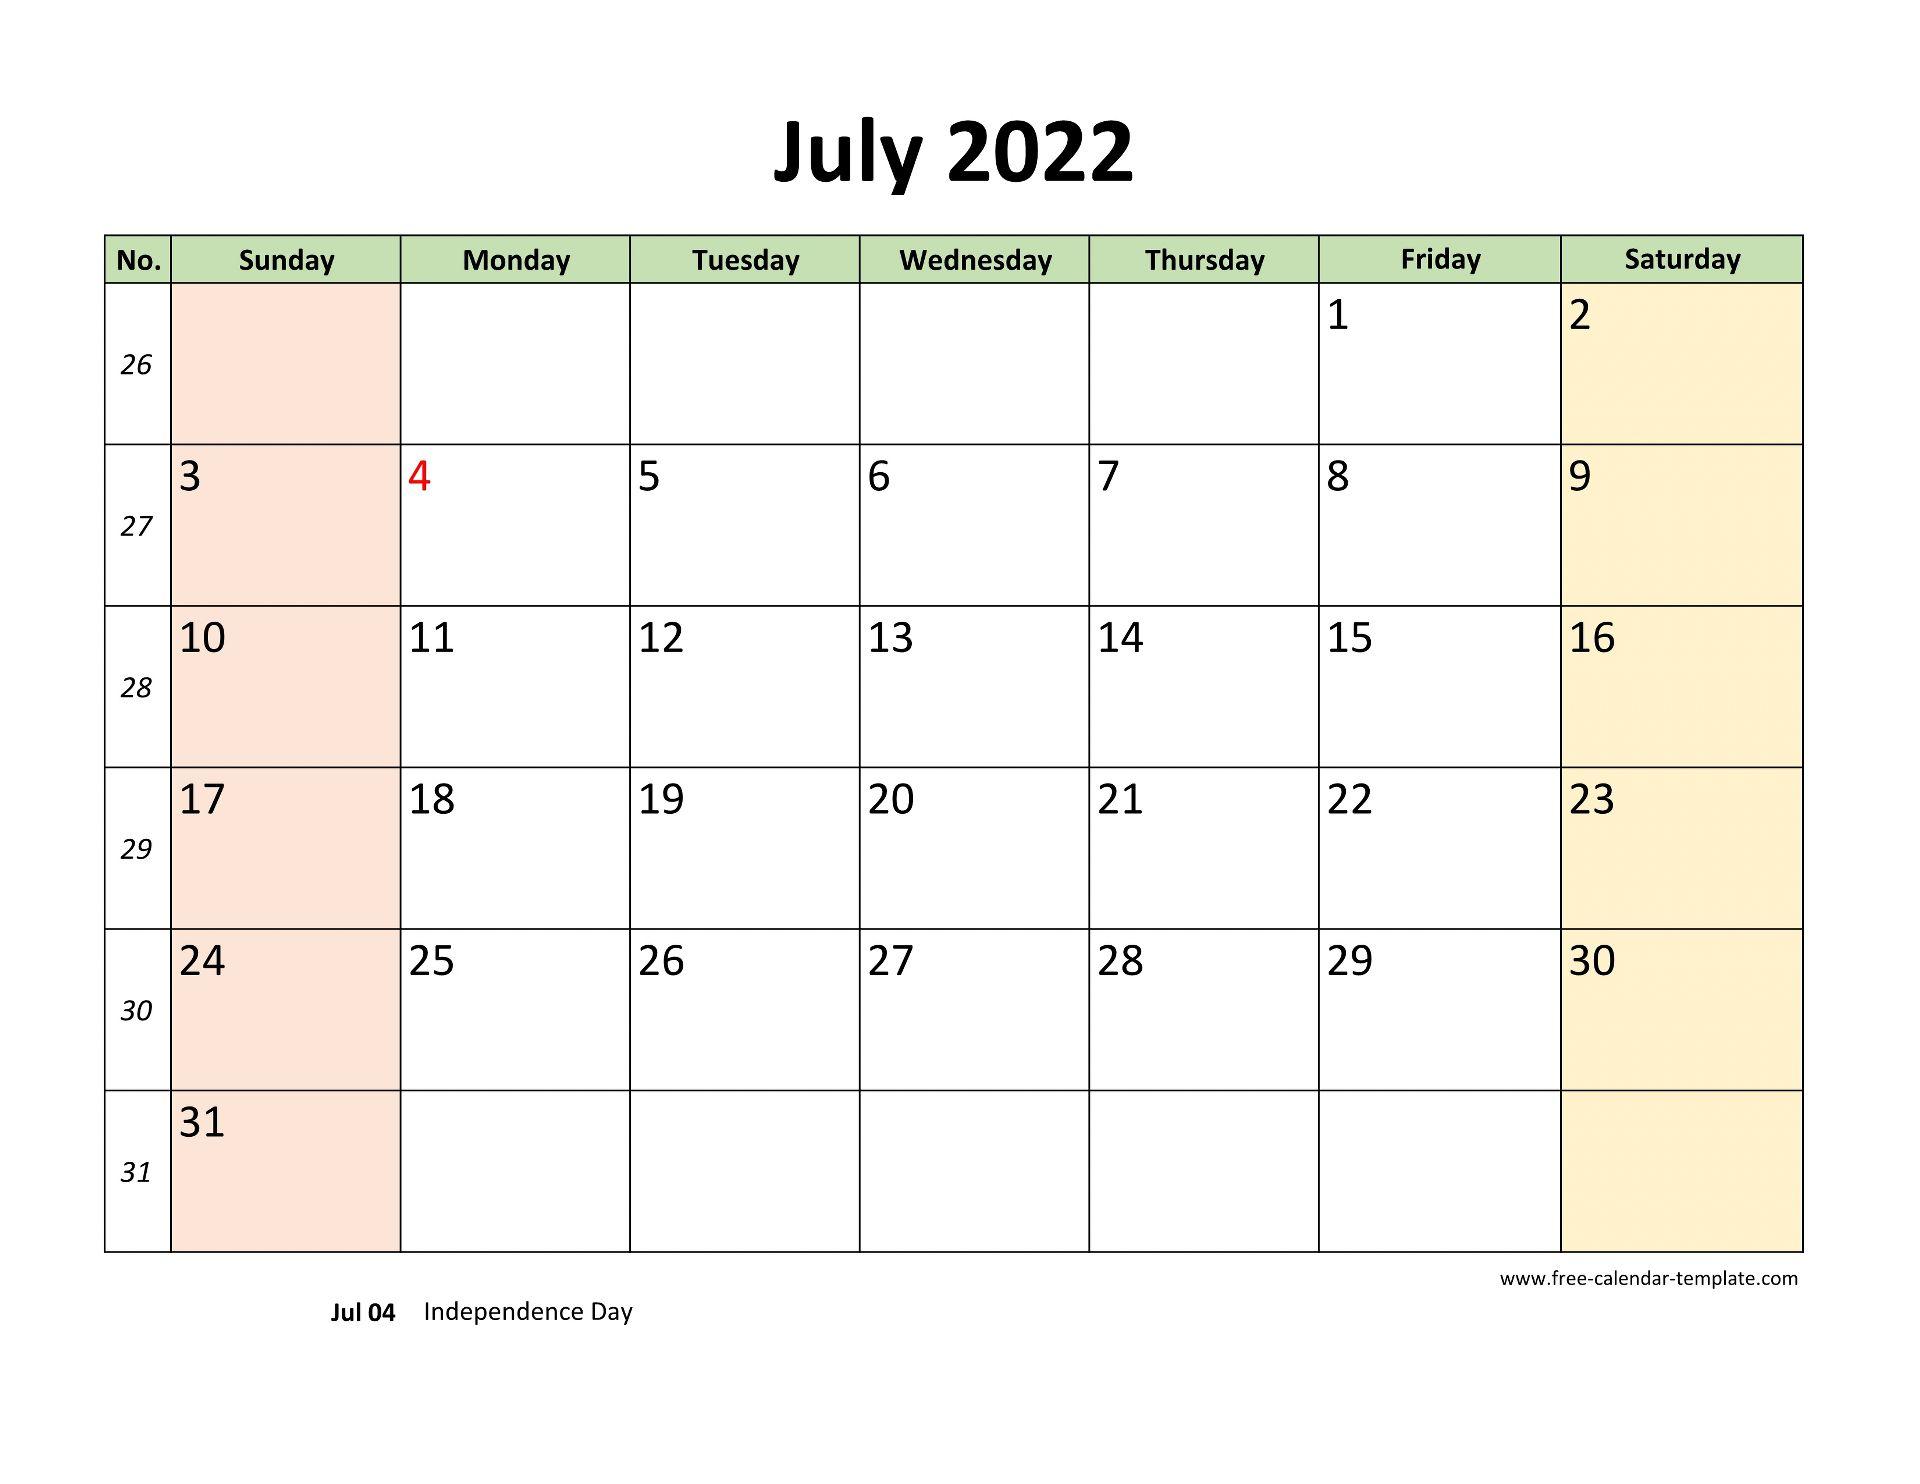 July 2022 Free Calendar Tempplate   Free-calendar-template.com